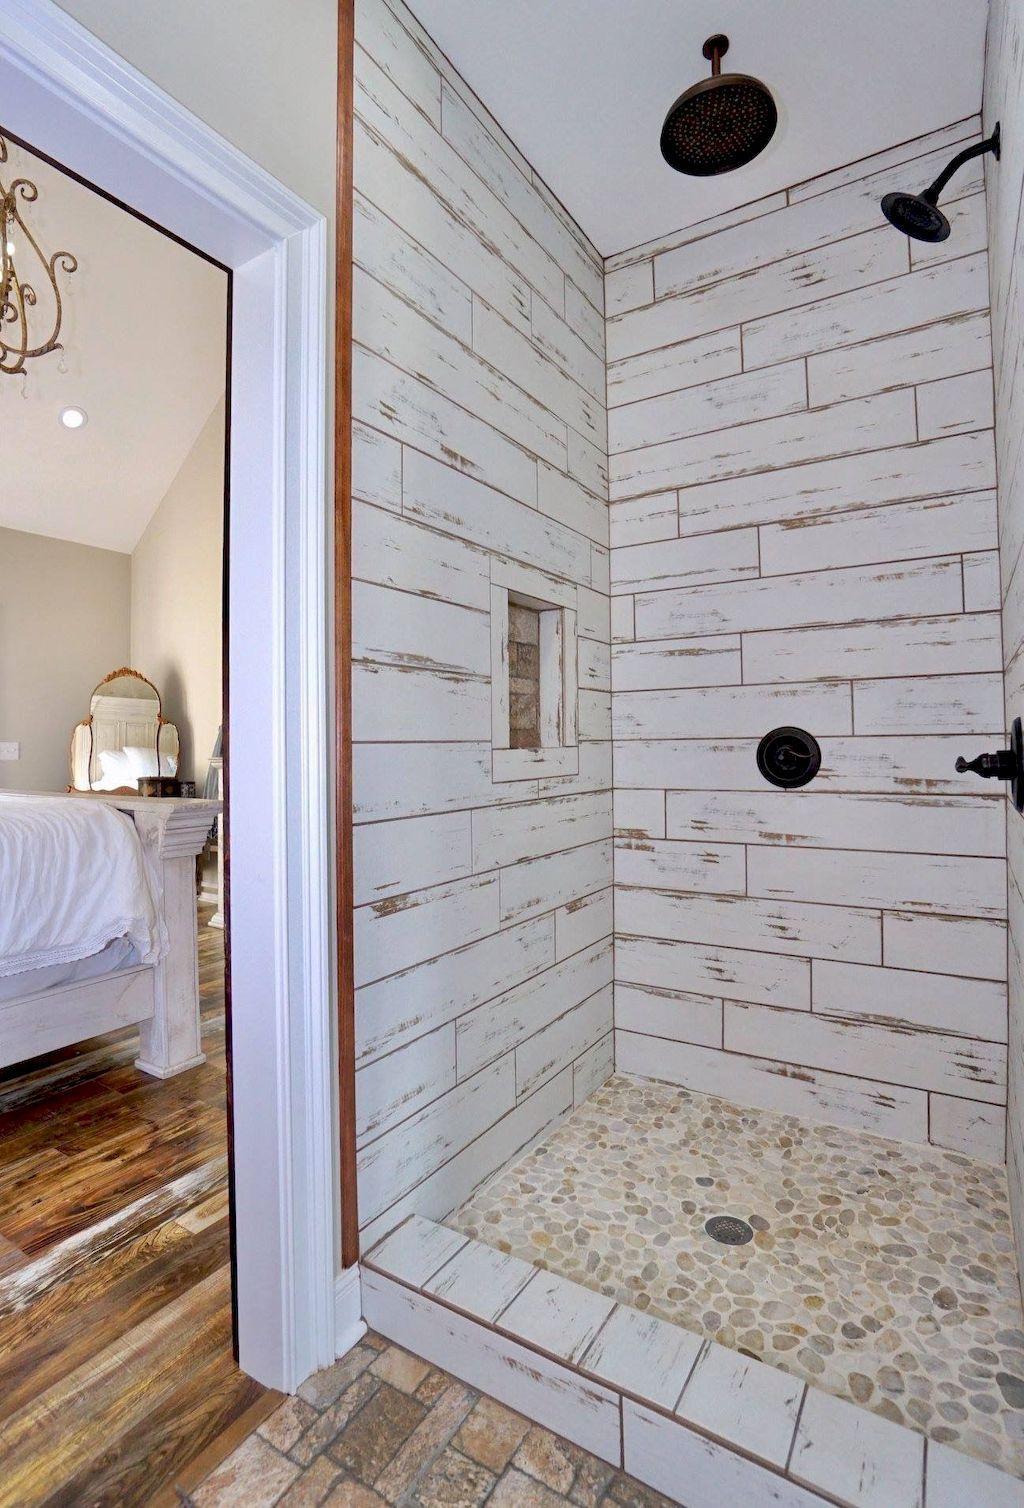 Astonishing Farmhouse Shower Tile Decor Ideas To Try 27